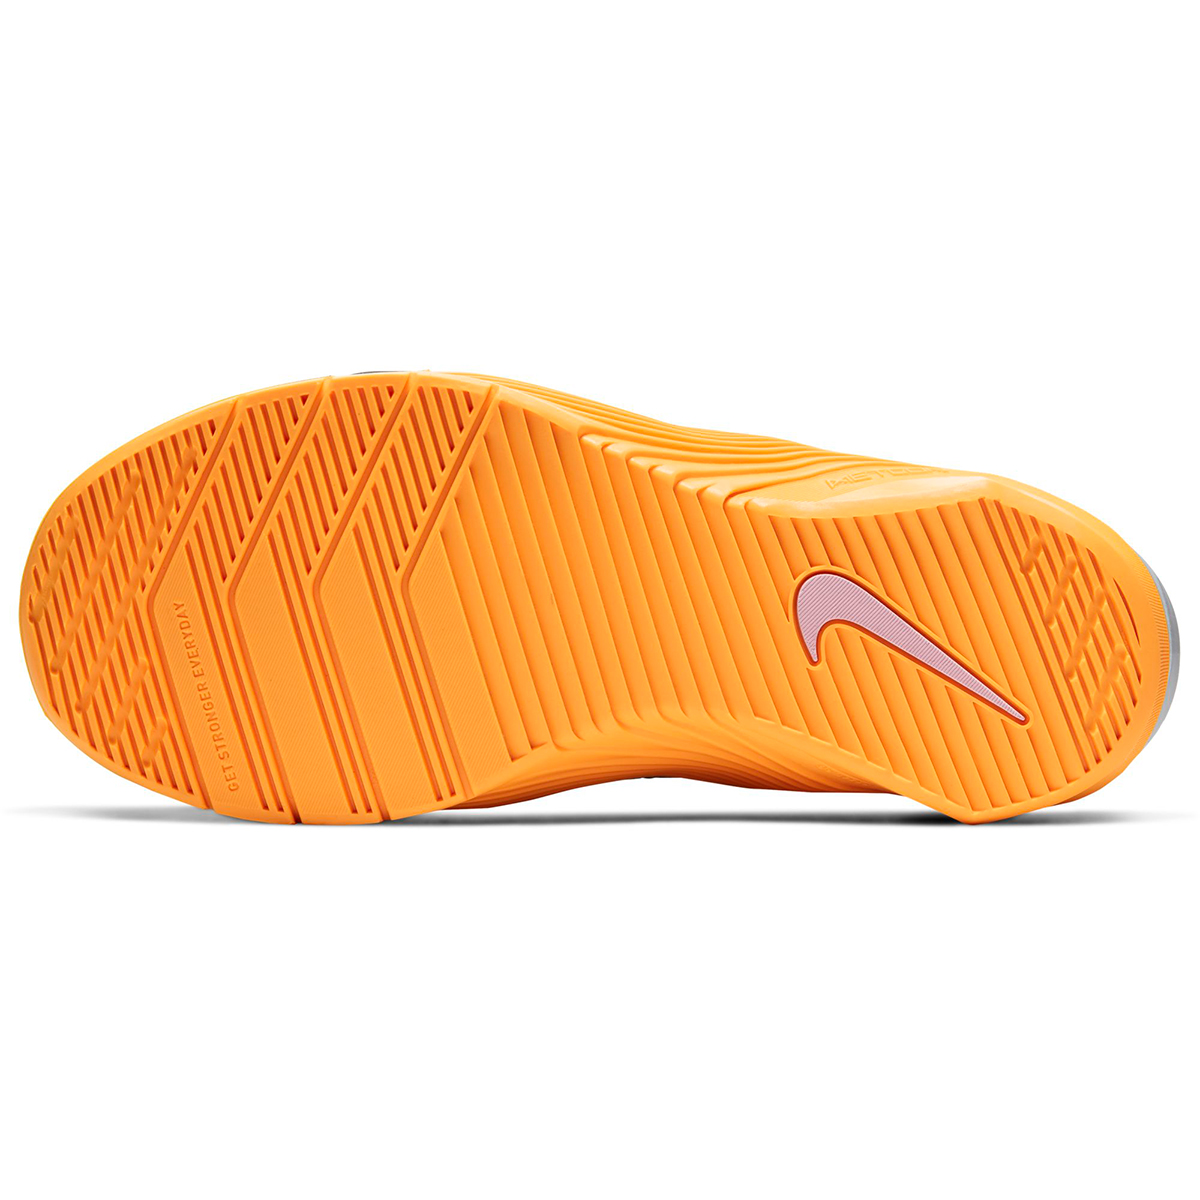 Women's Nike Metcon 5 Training Shoes - Color: Black/White/Laser Orange/Team Orange (Regular Width) - Size: 5, Black/White/Laser Orange/Team Orange, large, image 6